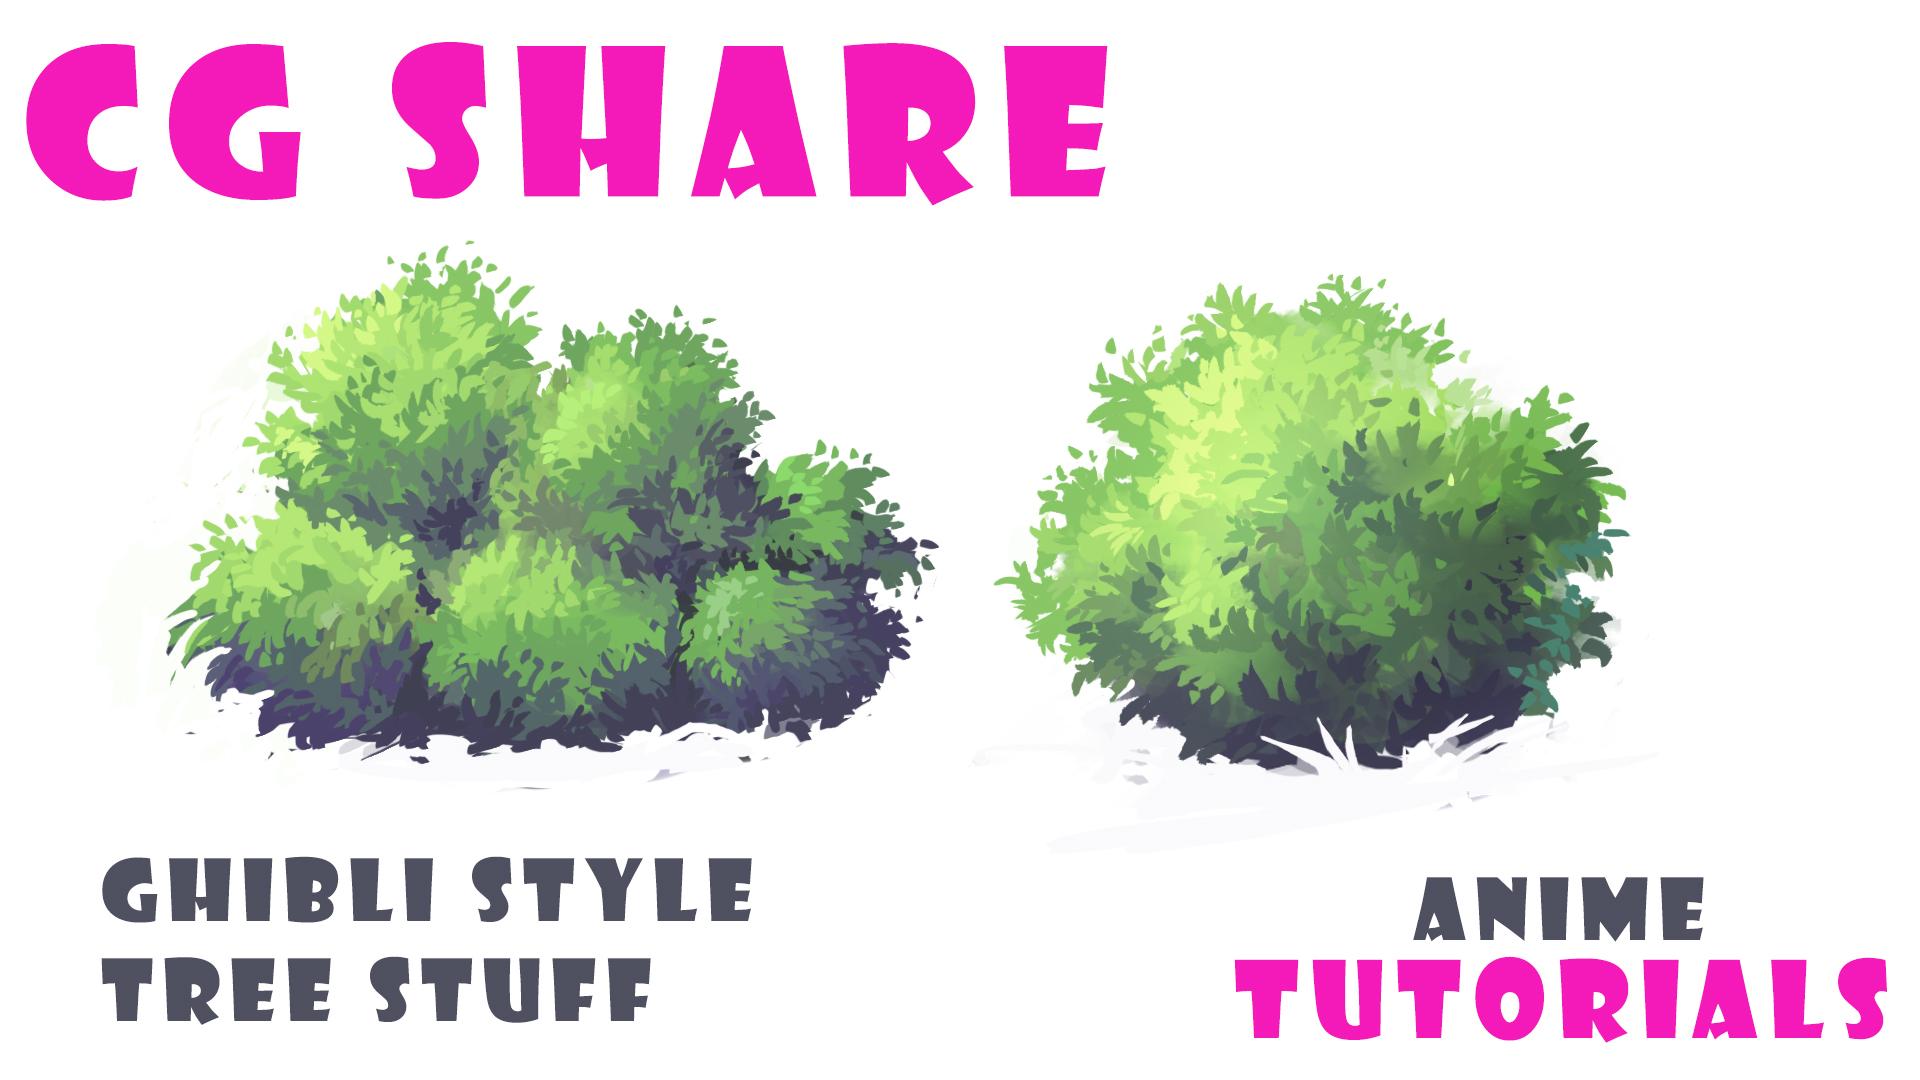 ANIME DRAWING | CGSHARE | GHIBLI STYLE | TREE STUFF